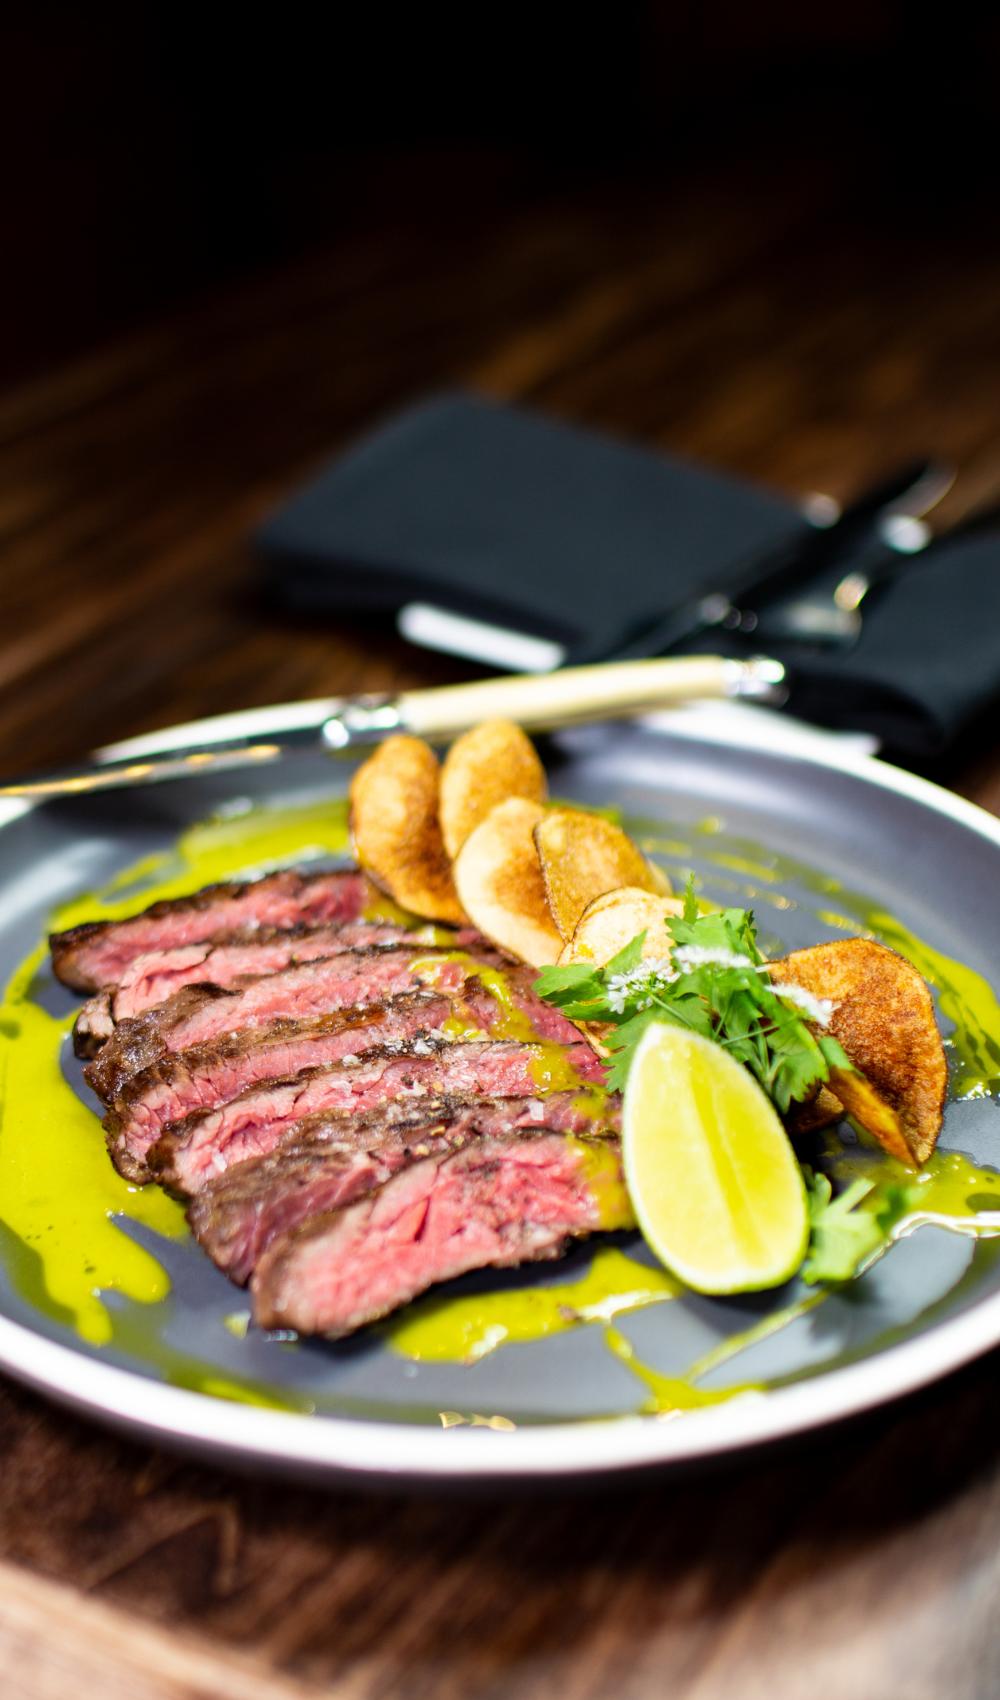 gourmet steak meal plated nicely